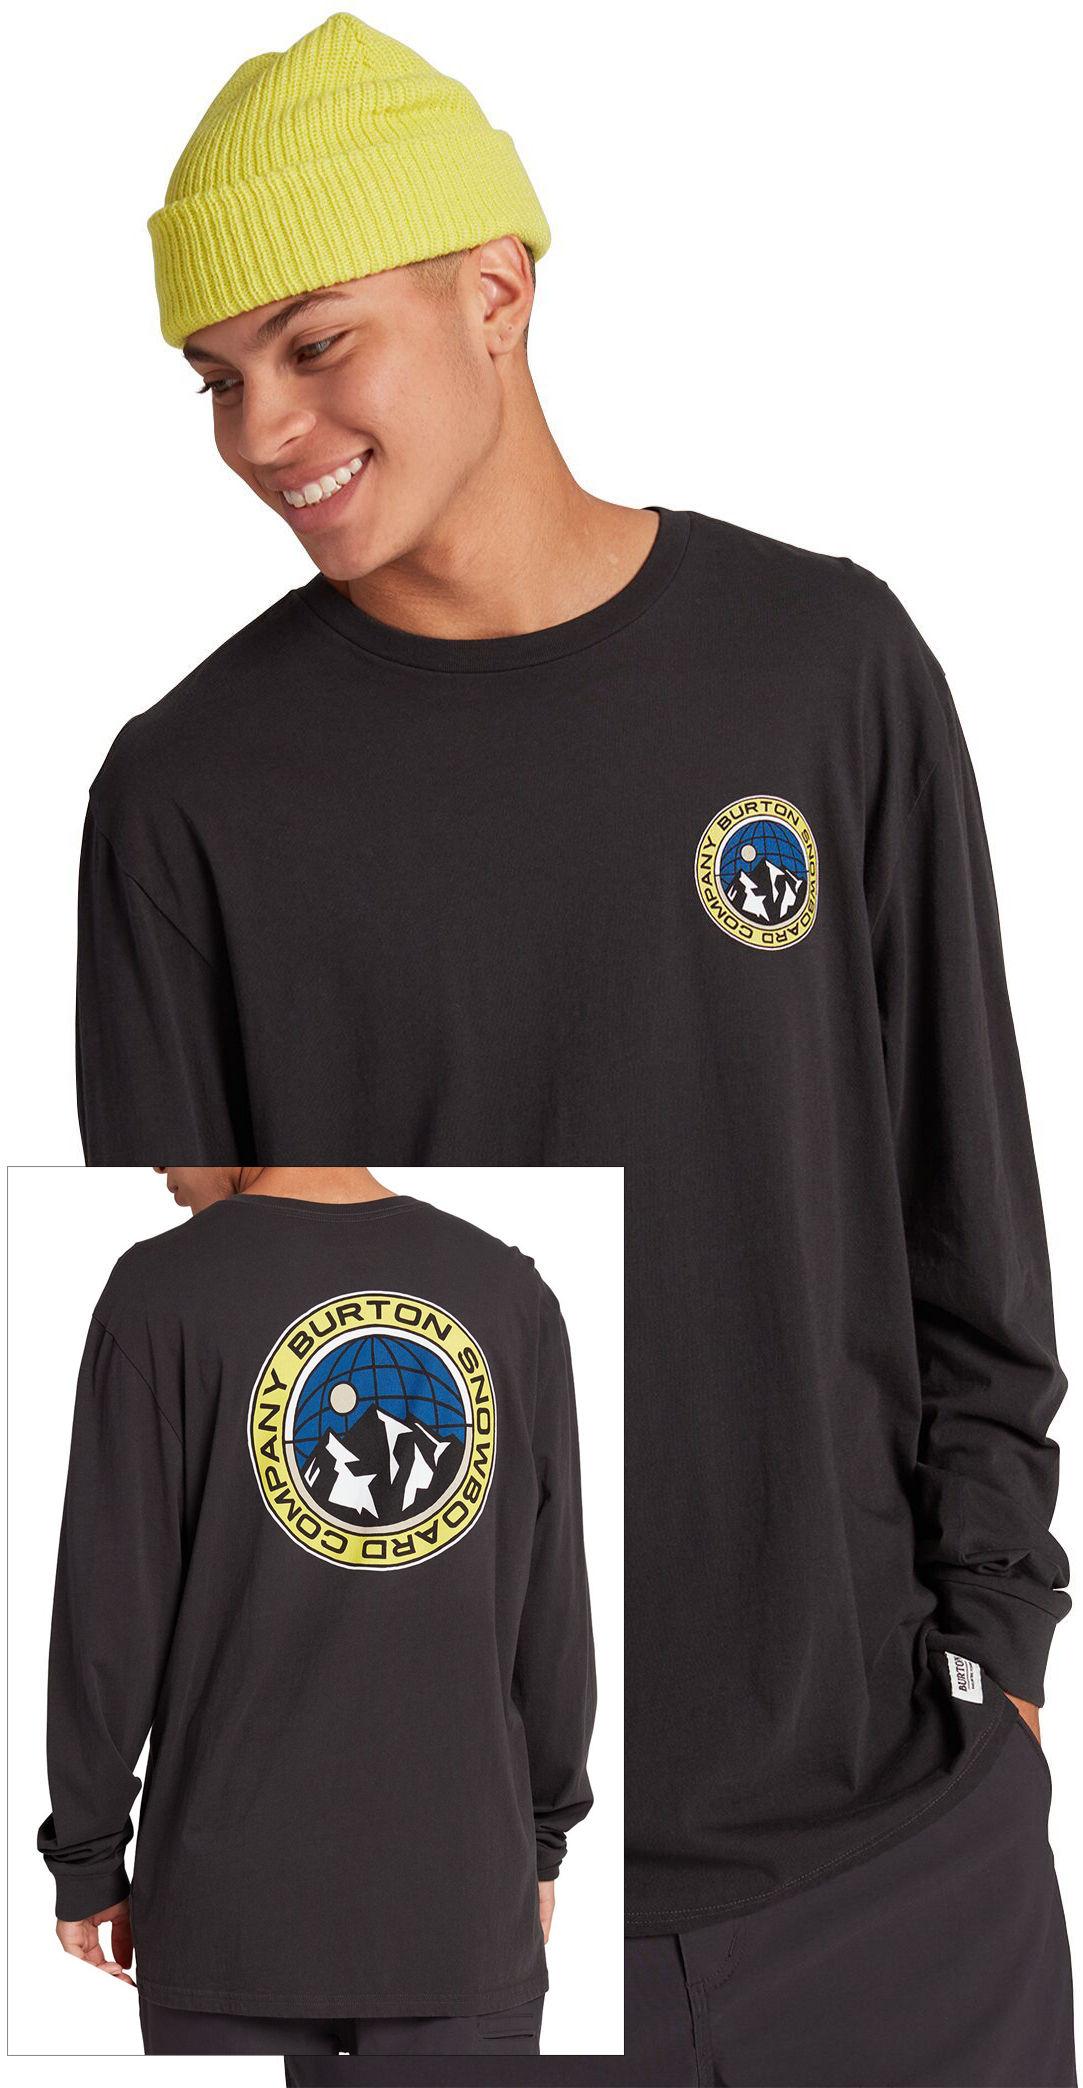 t-shirt męski BURTON WALGROVE LS Phantom